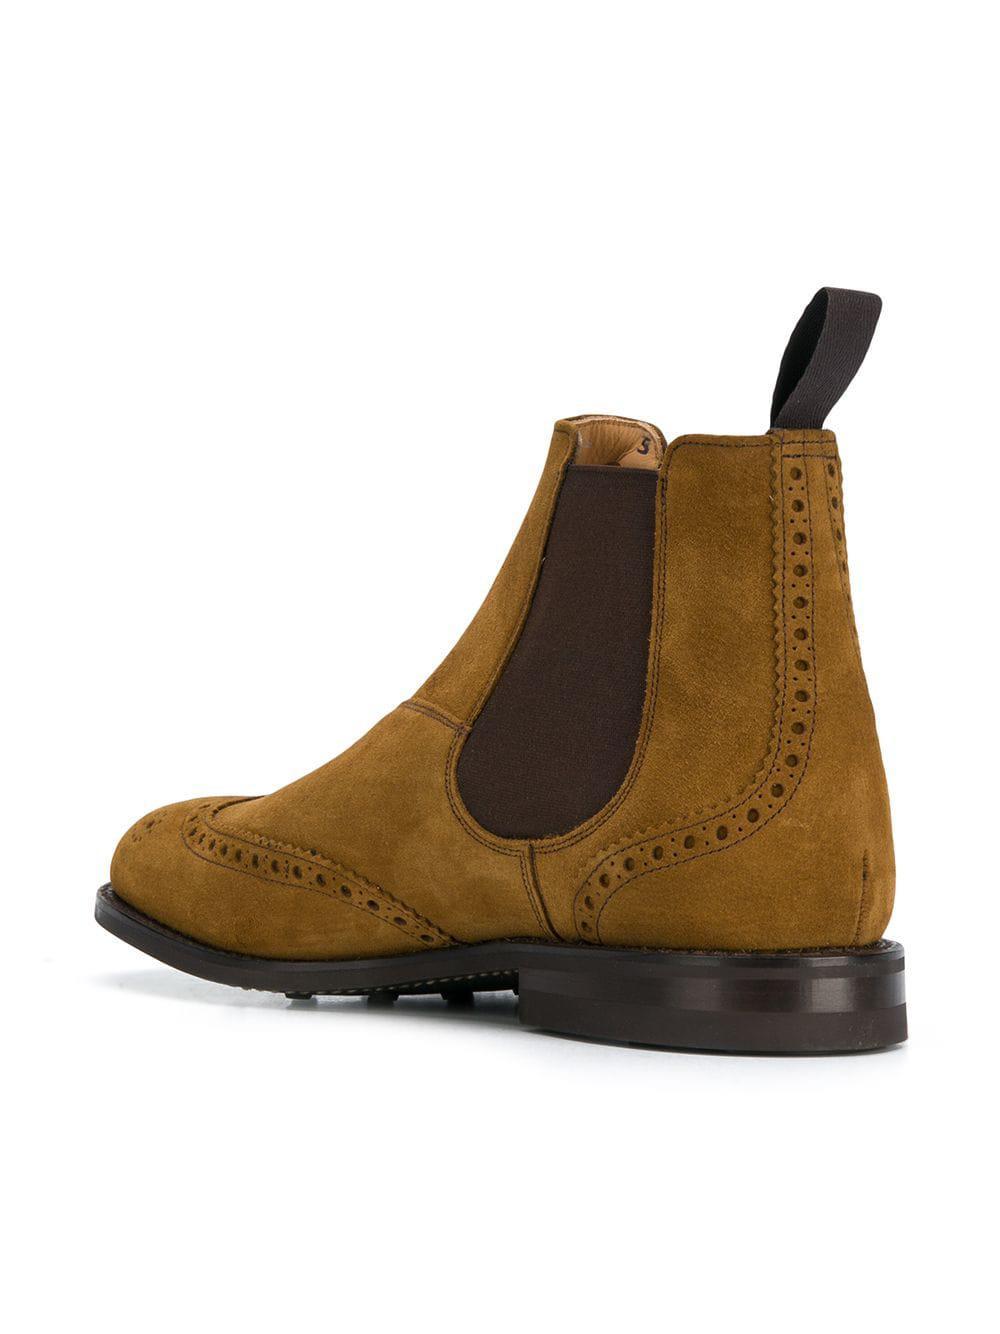 673479f5e0 Lyst - Botas de vestir Chelsea Church s de hombre de color Marrón